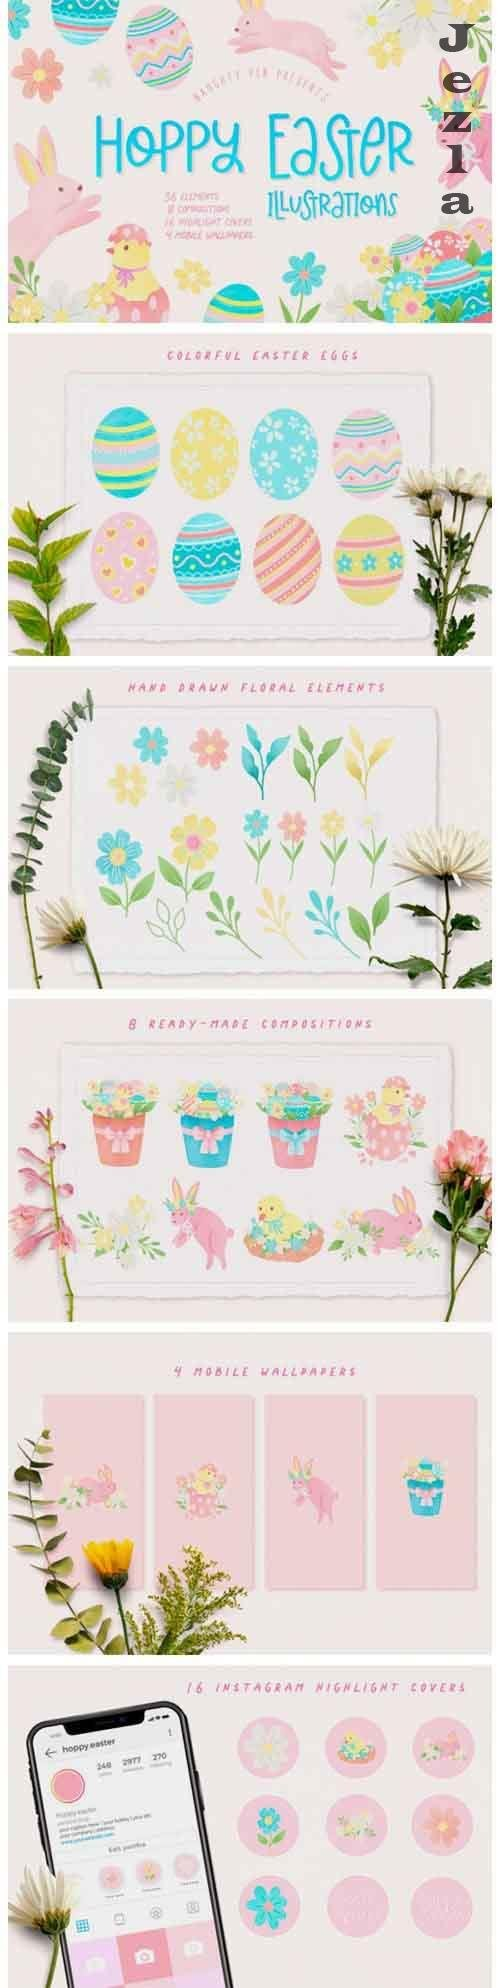 Hoppy Easter Spring Bunnies Illustrations Set - 1212116